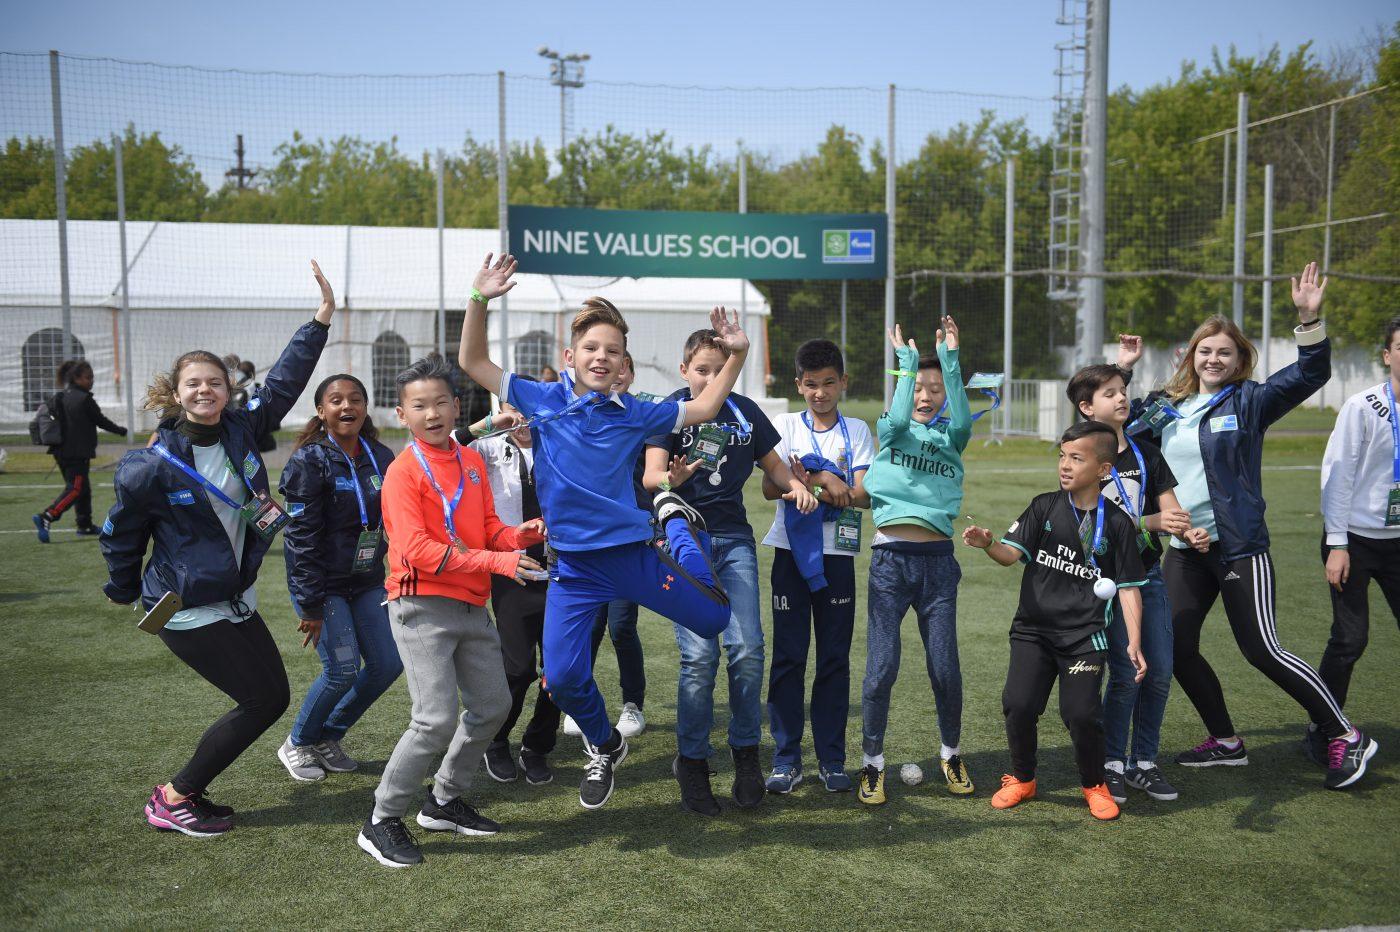 football-pour-amitie-programme-uefa-fifa-gazprom-1